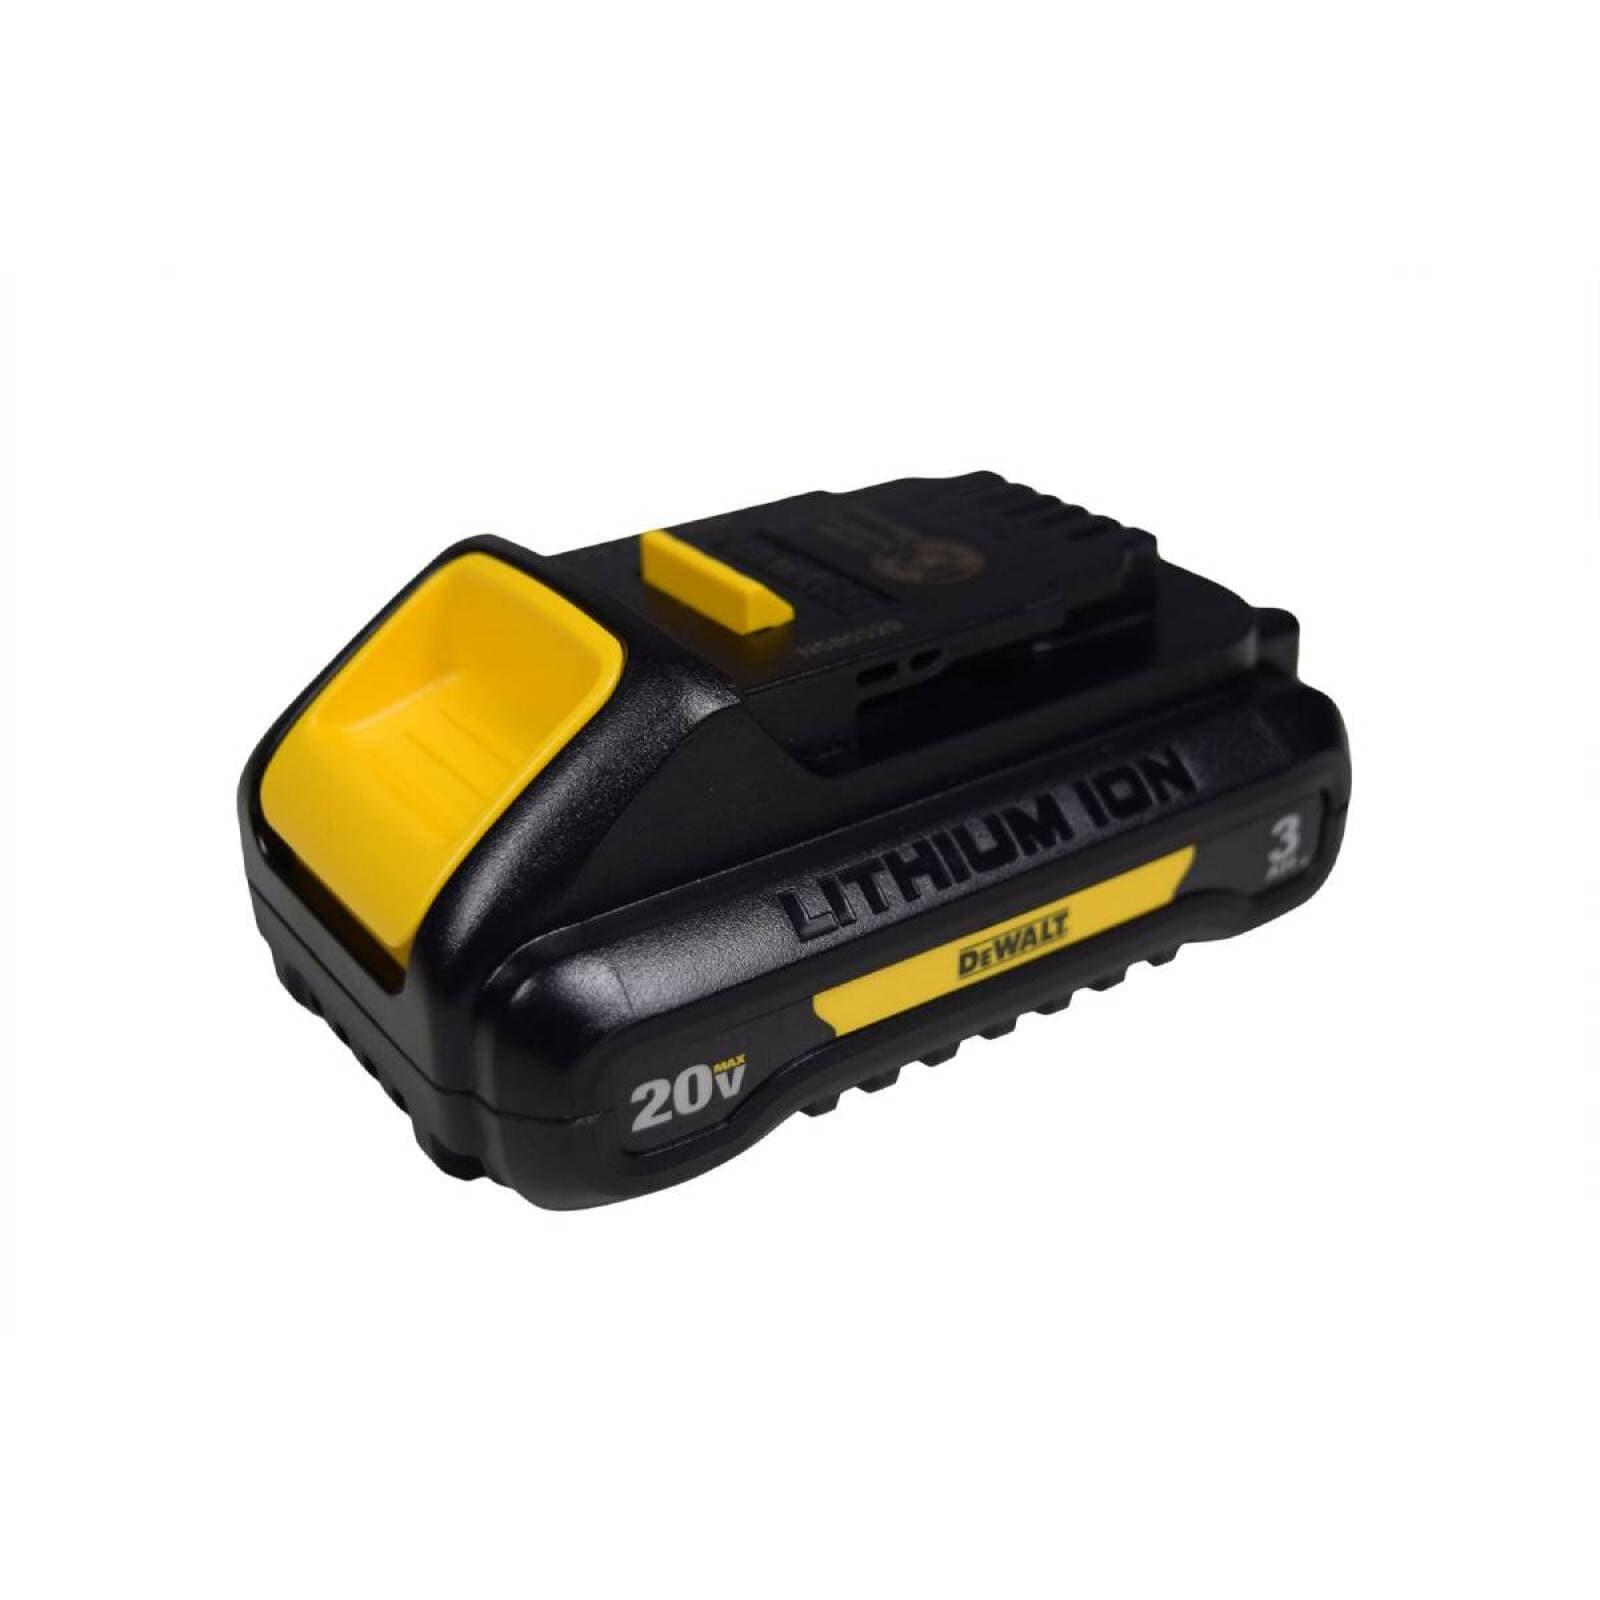 Taladro Rotomartillo 20V Brushless + Cargador Bateria DeWalt